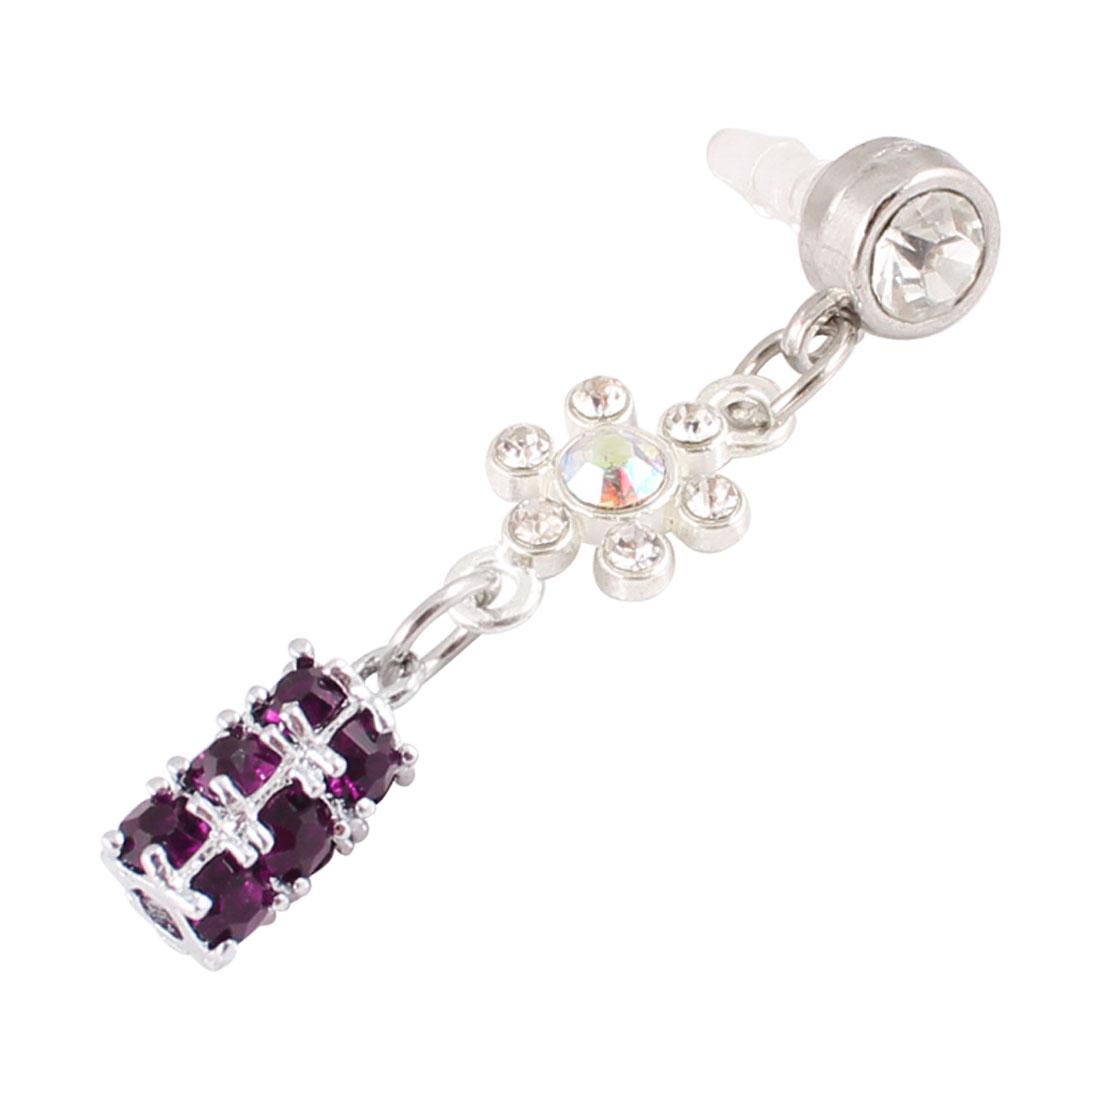 Dangle Purple Crystal 3.5mm Anti Dust Earphone Cap Stopper for Cell Phone